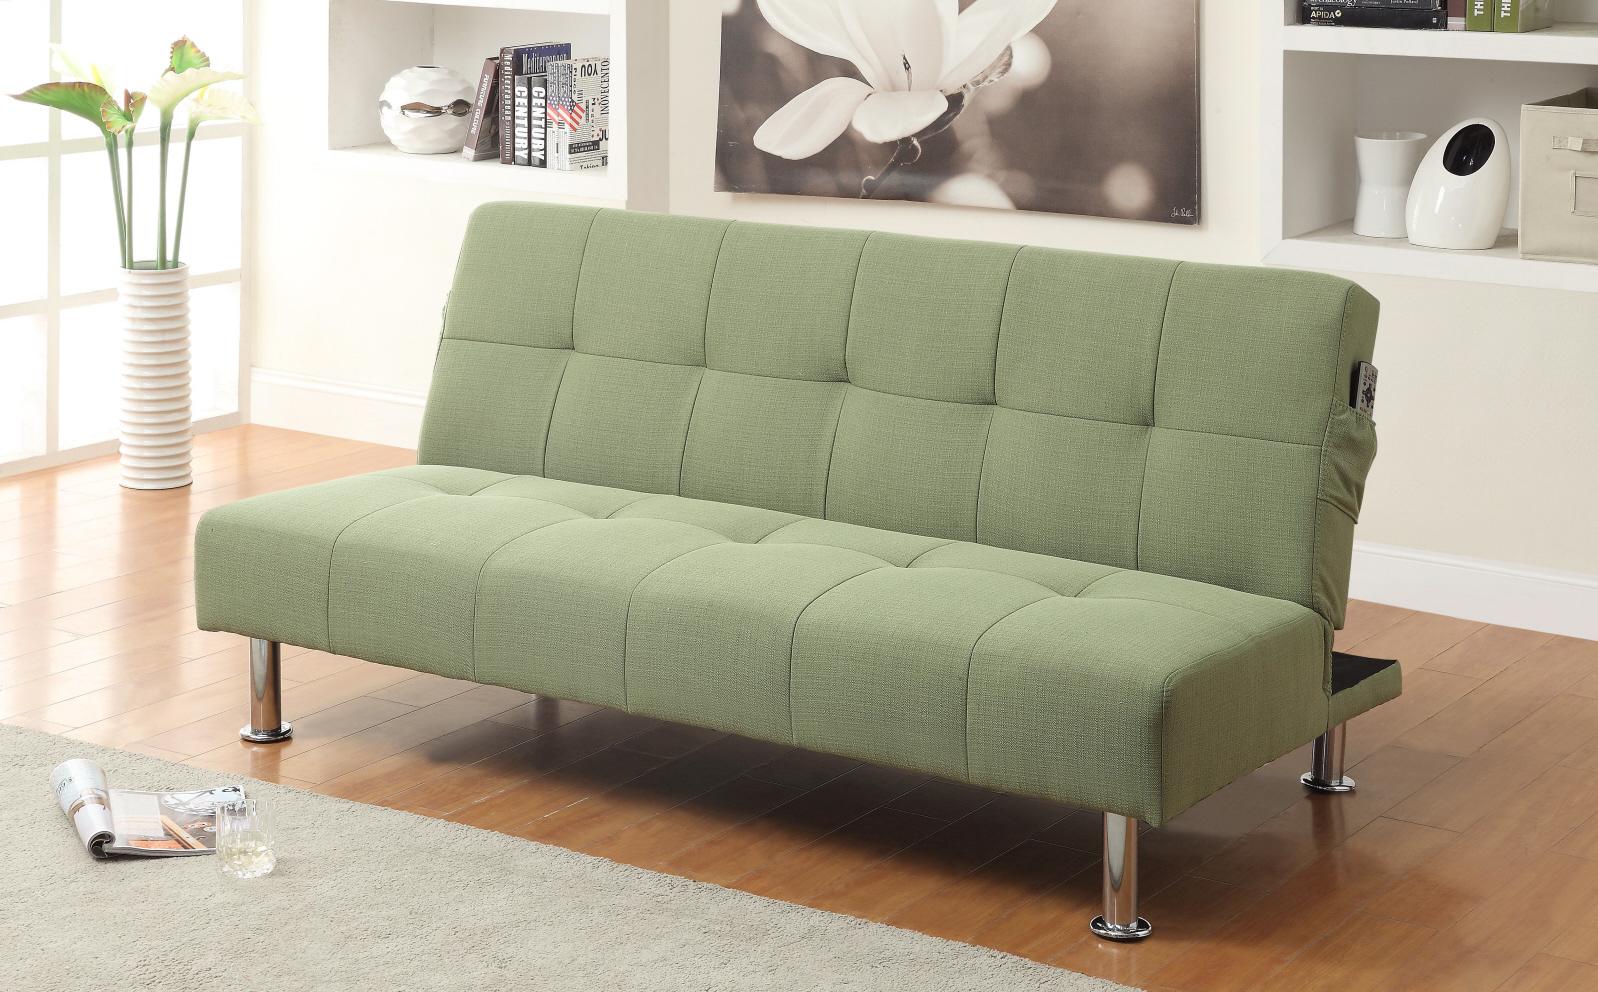 continental tulsa futon futons orig biltmore